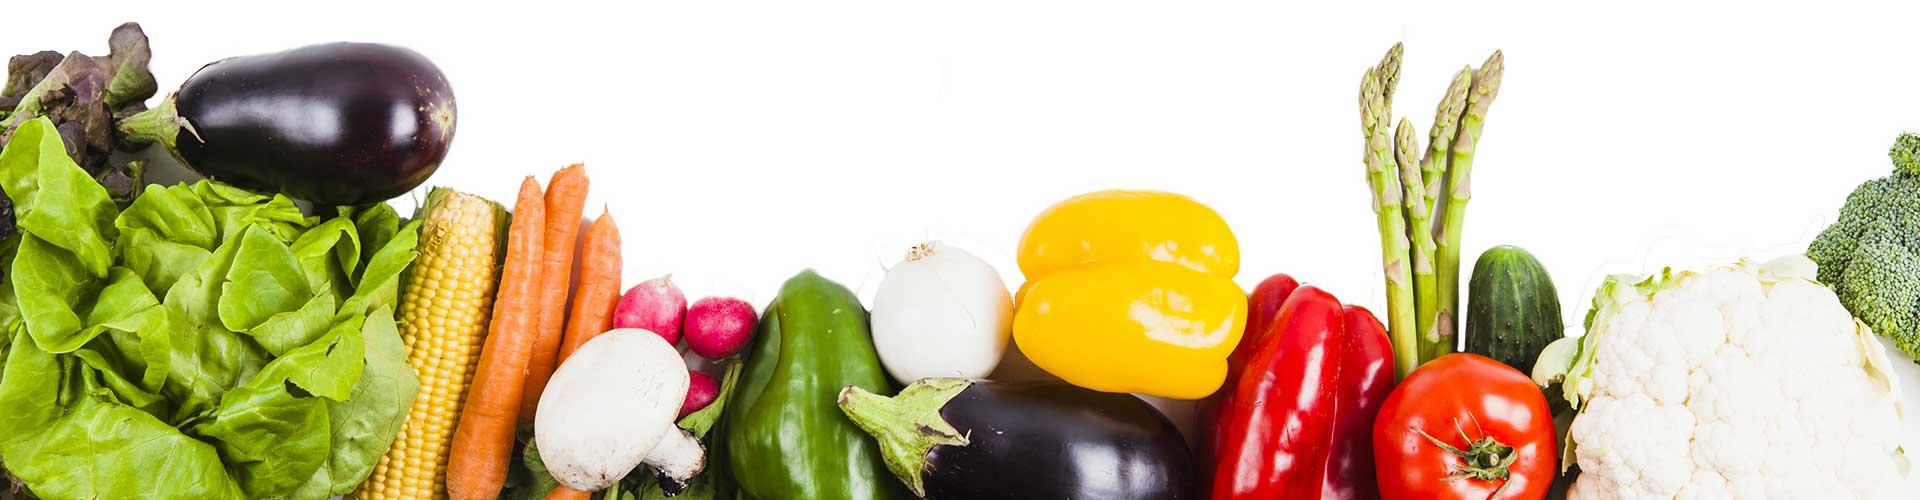 amparo-bayarri-verduras